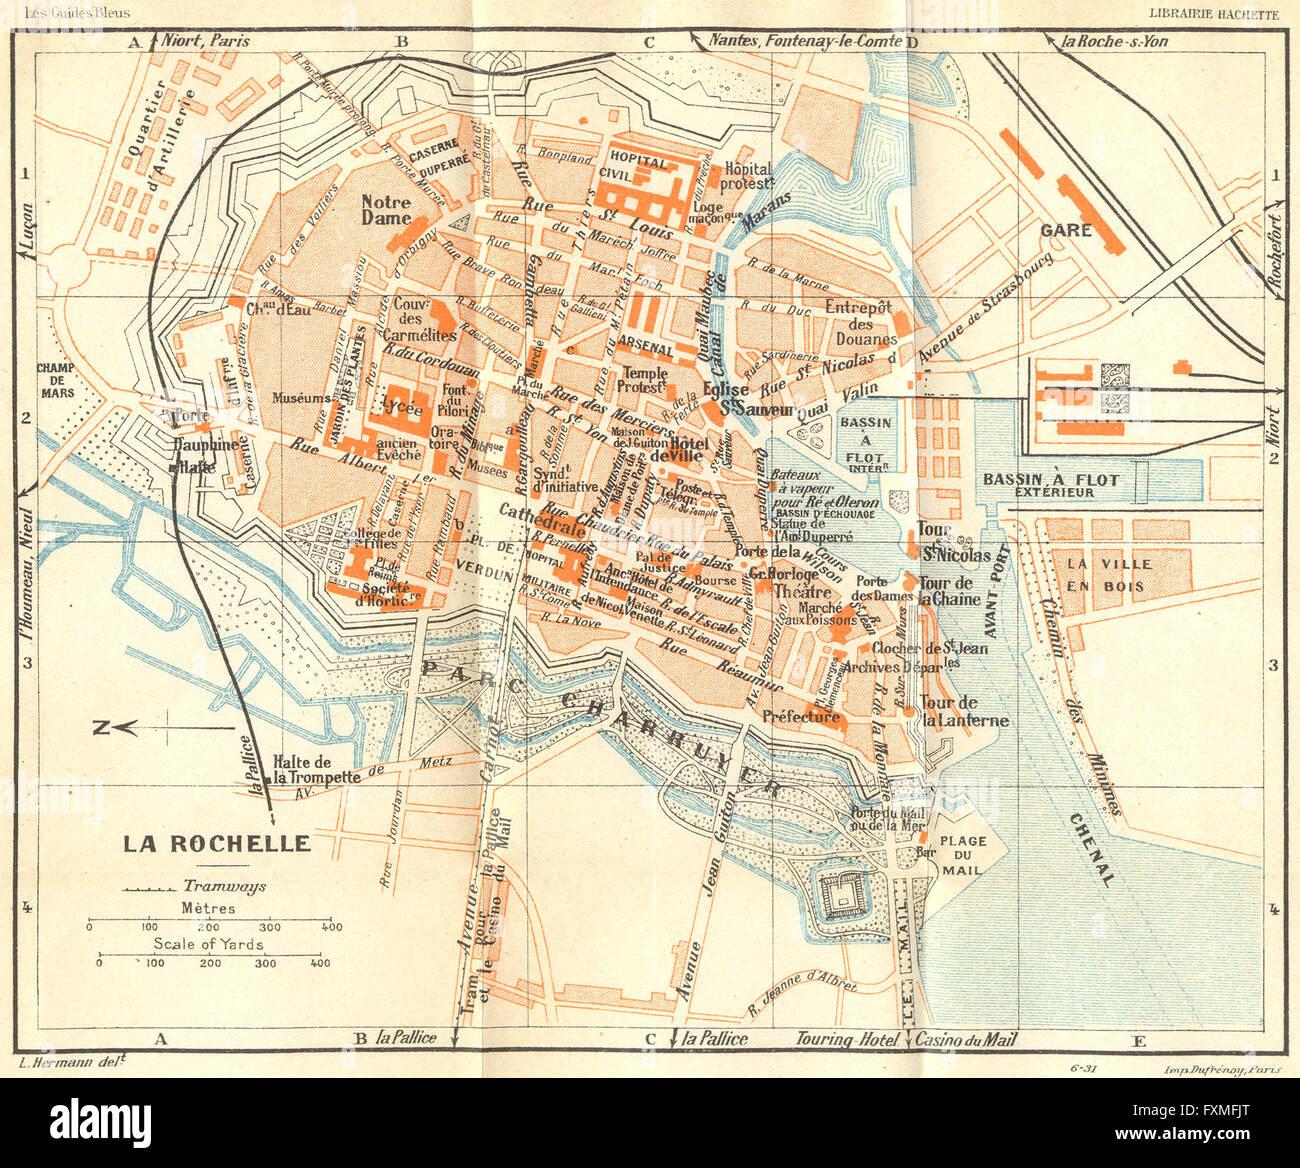 Map Of France La Rochelle.France La Rochelle 1932 Vintage Map Stock Photo 102484224 Alamy